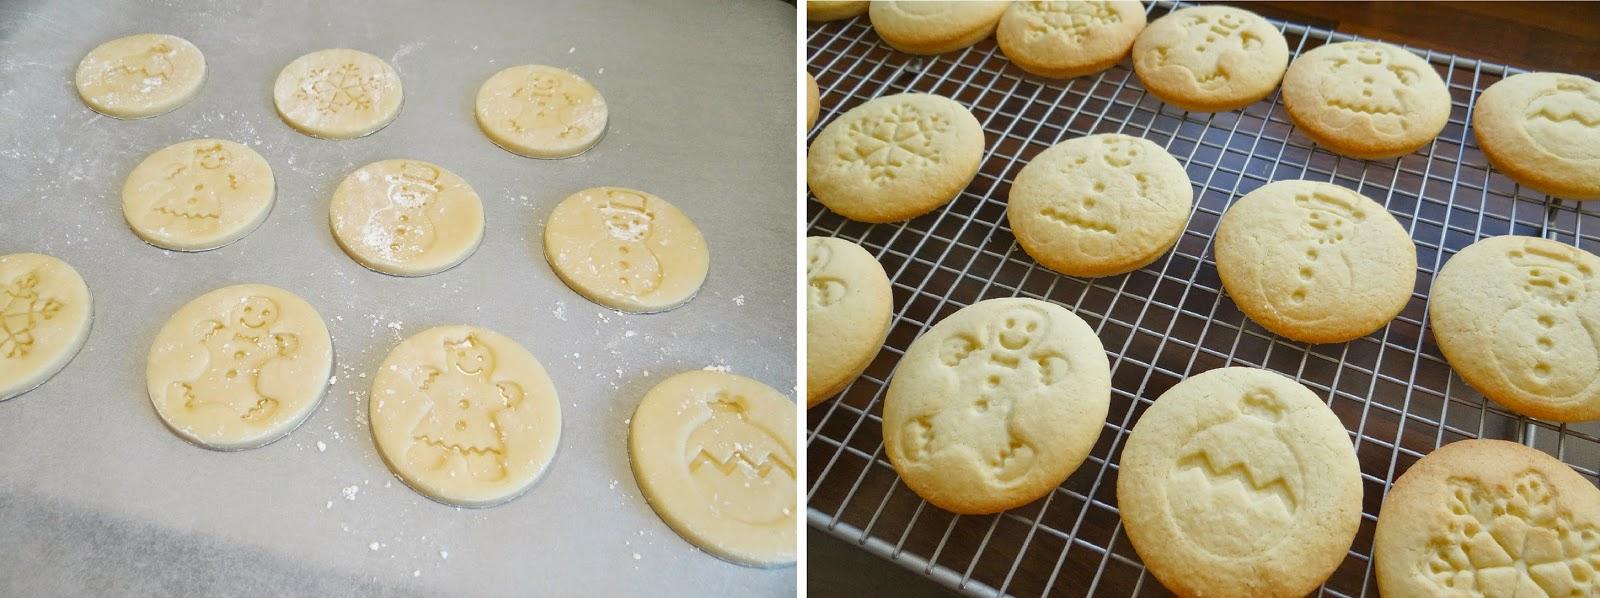 Christmas Baking, Chef'n Winter Cookie Stamp, handmade Christmas Gifts